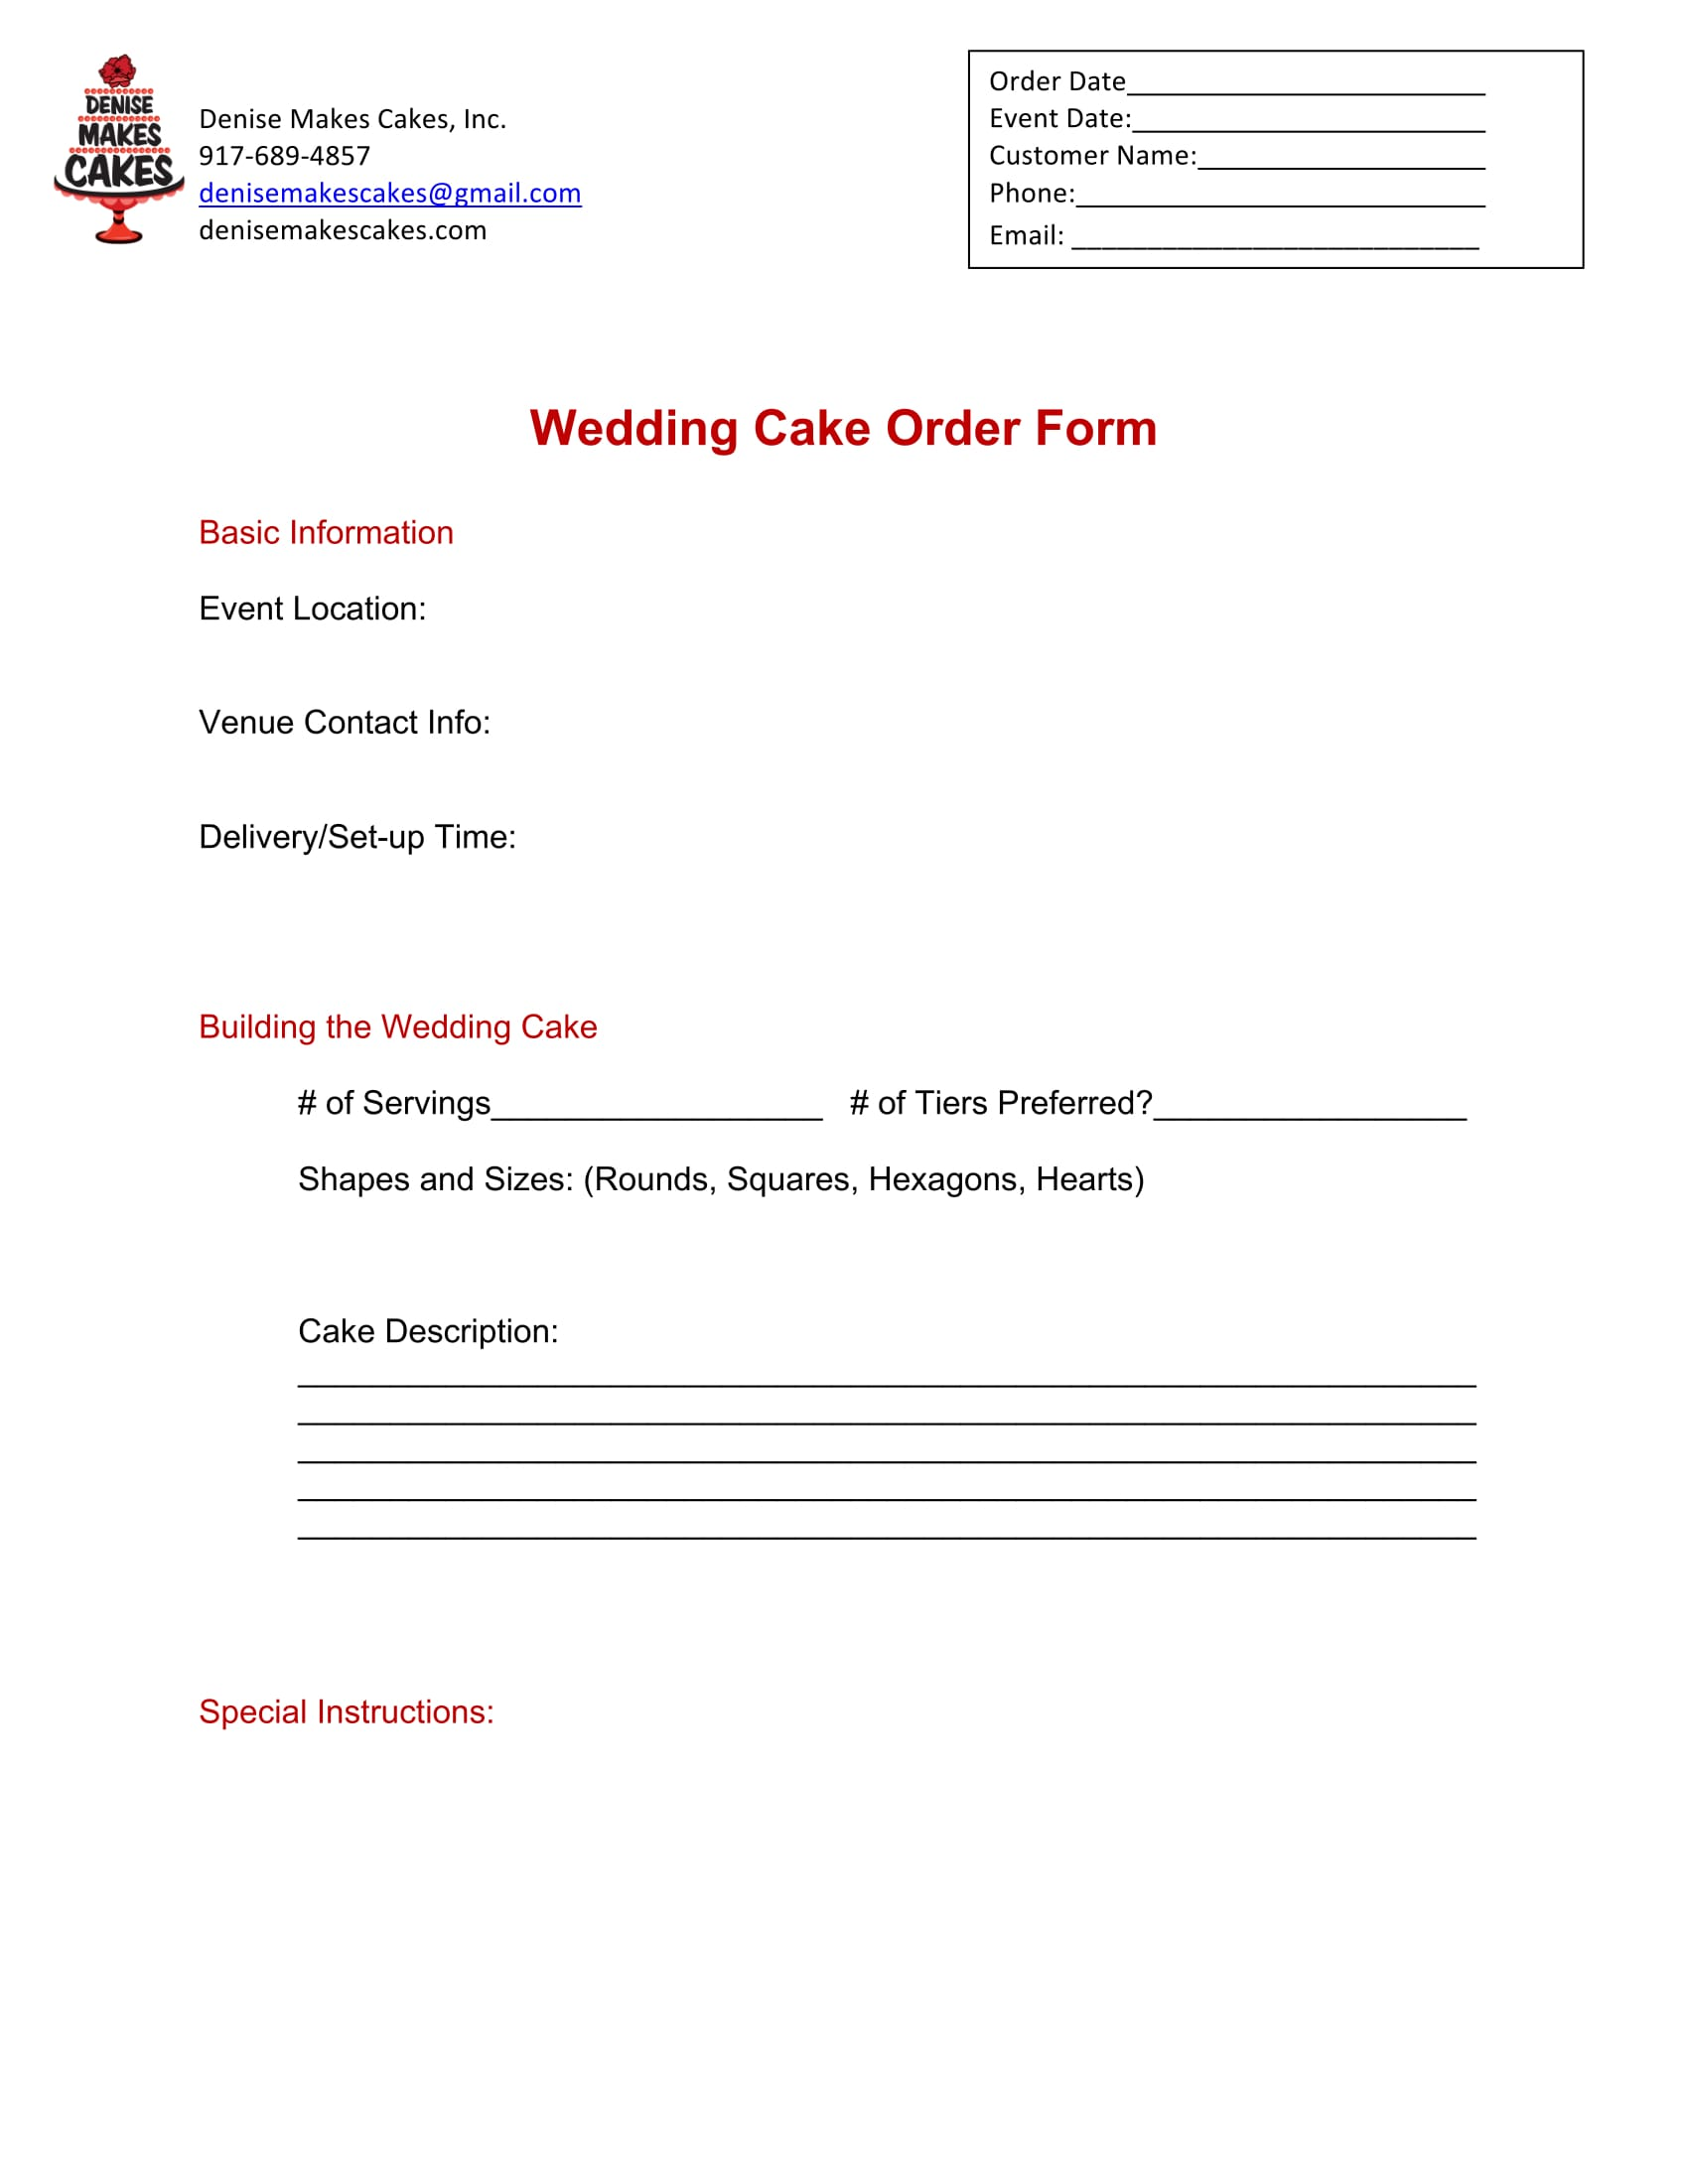 wedding cake order form 1